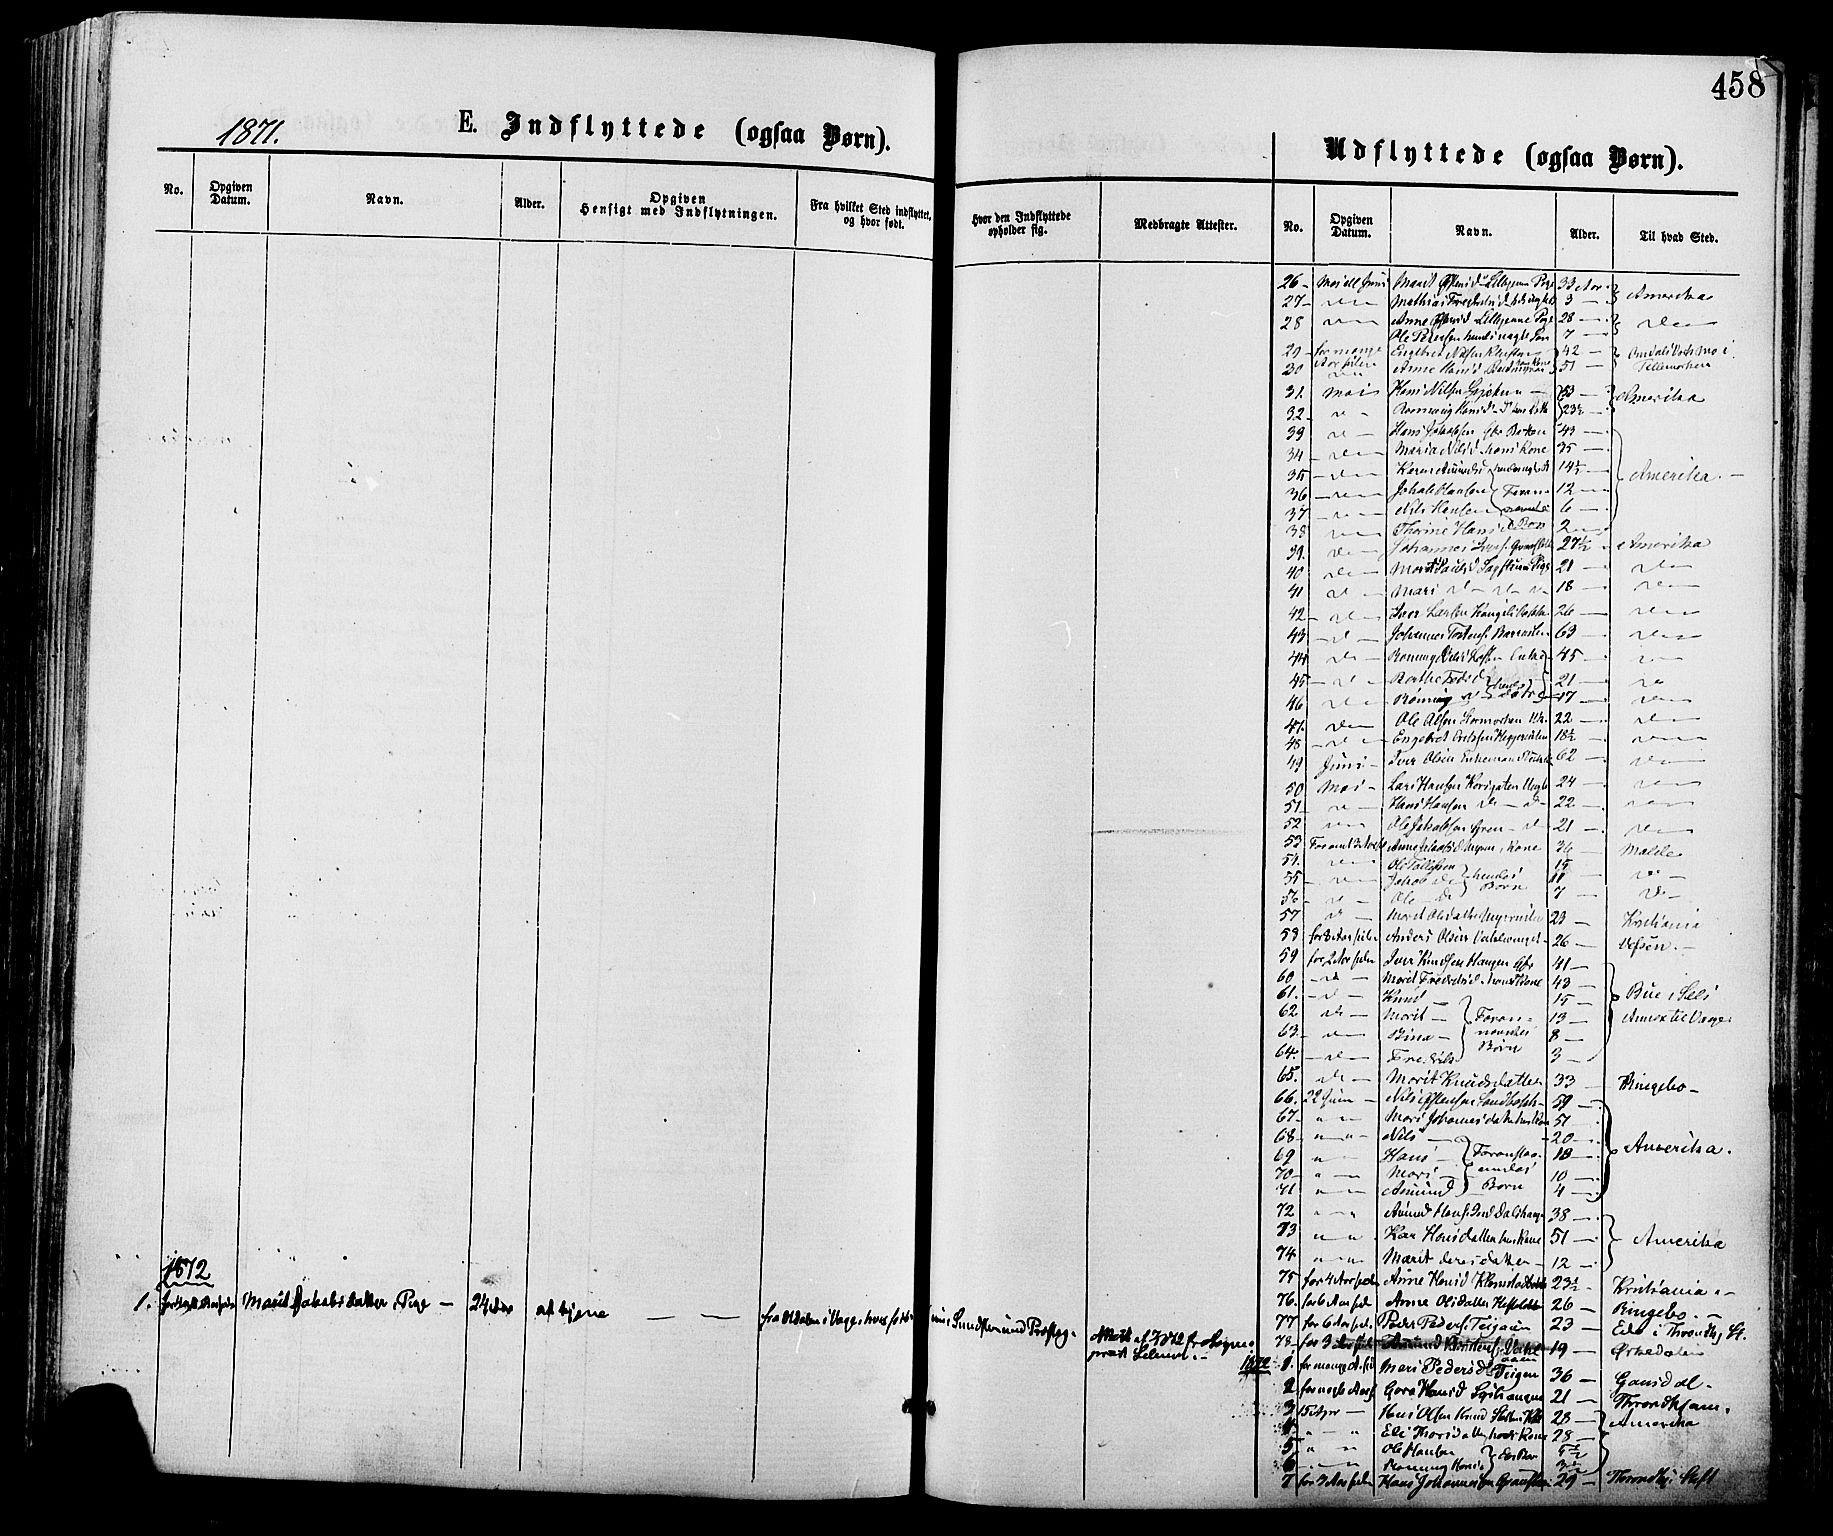 SAH, Nord-Fron prestekontor, Ministerialbok nr. 2, 1865-1883, s. 458